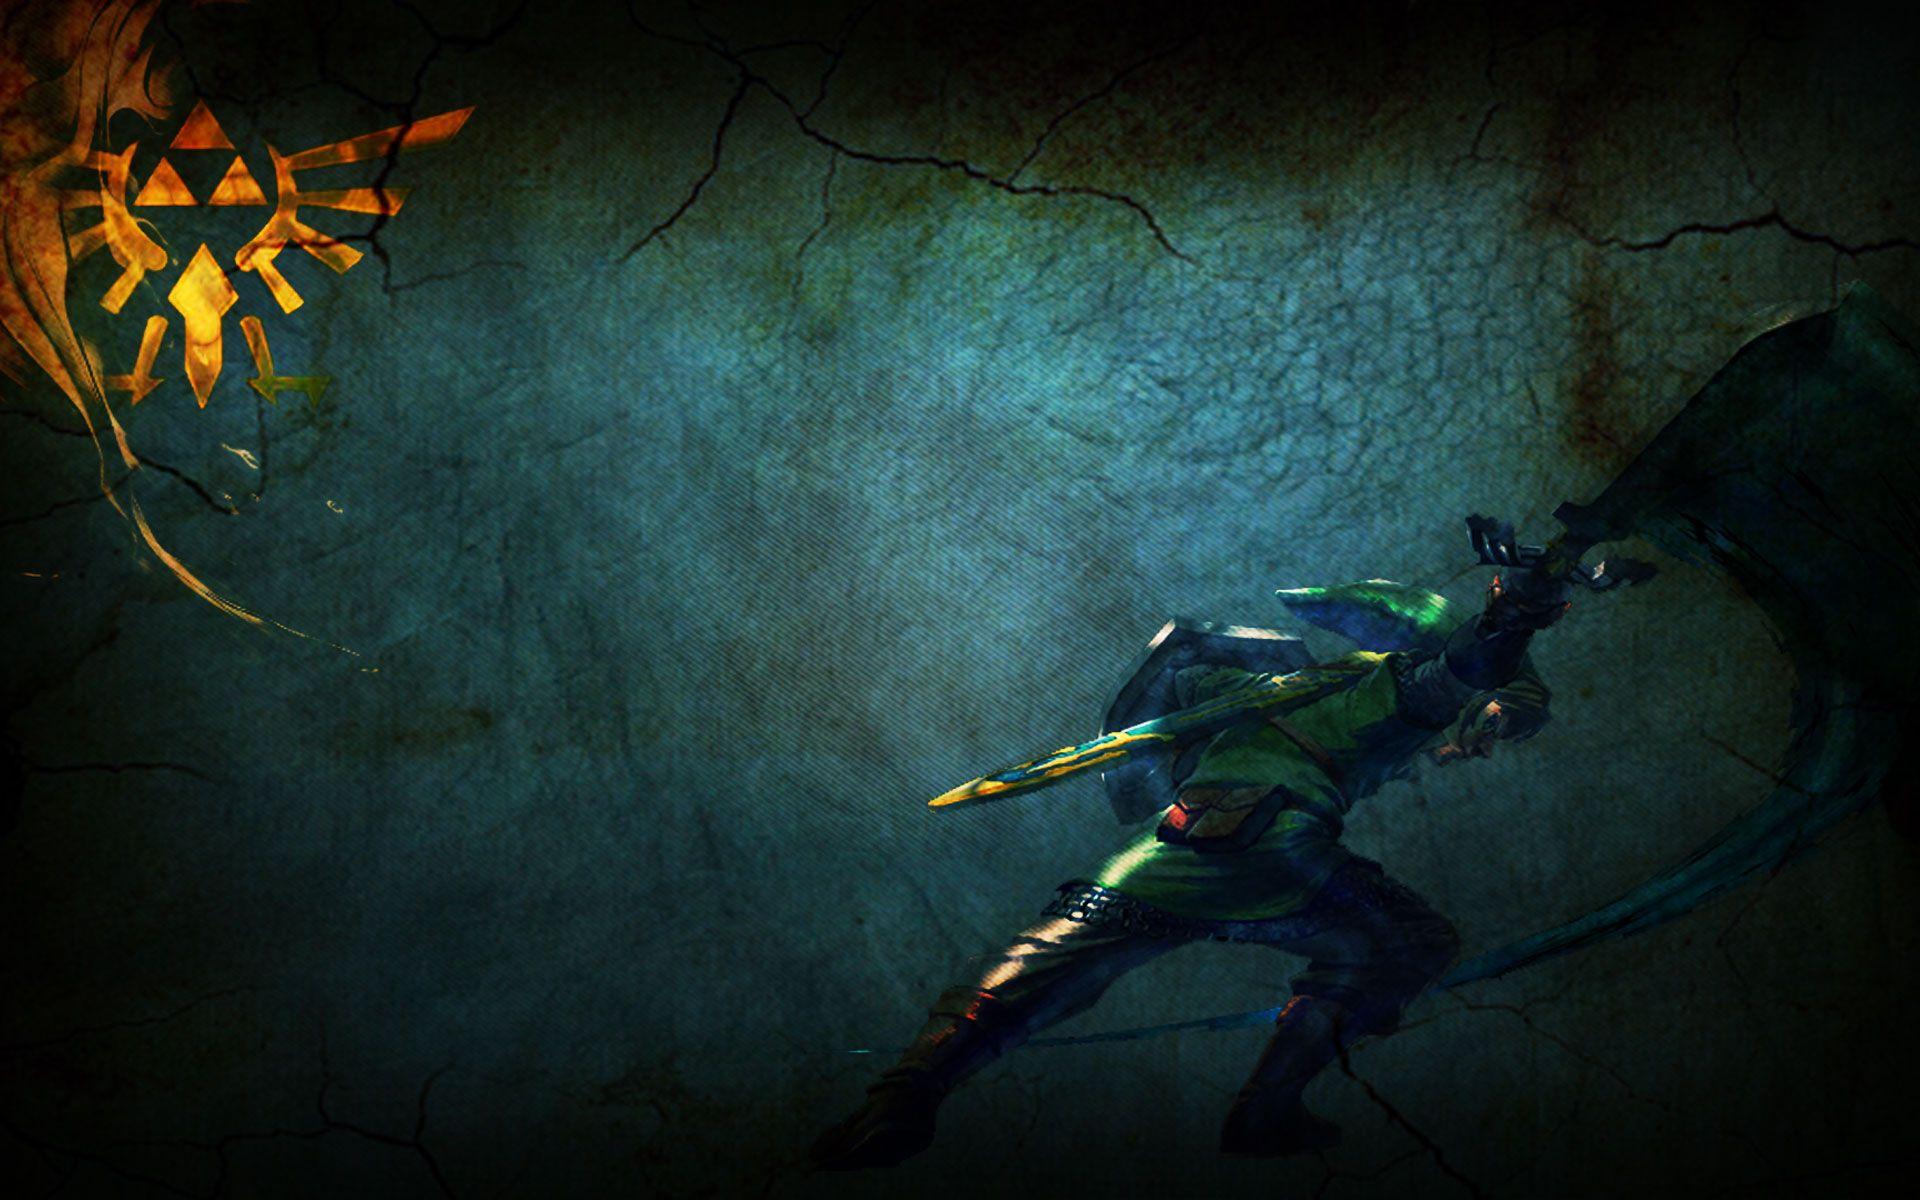 375 Zelda Hd Wallpapers Backgrounds Wallpaper Abyss